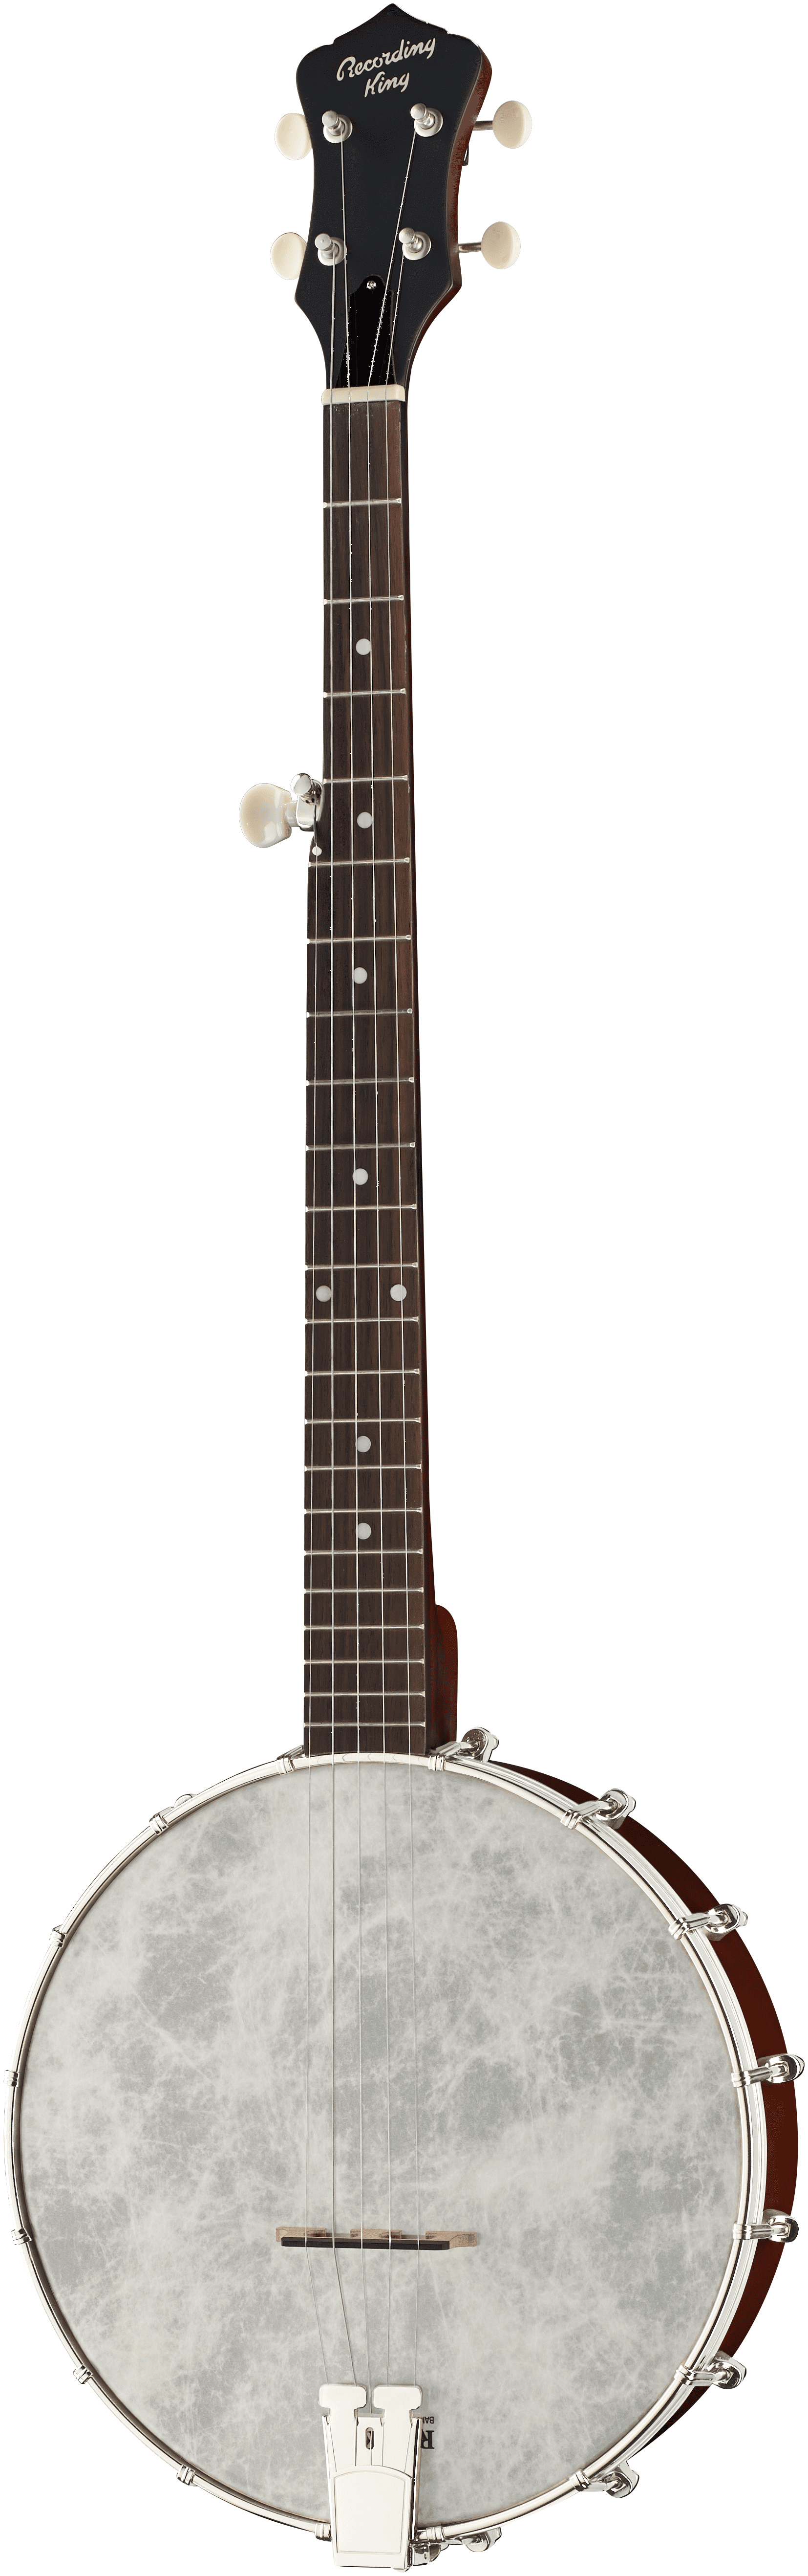 My First Banjo | t blog